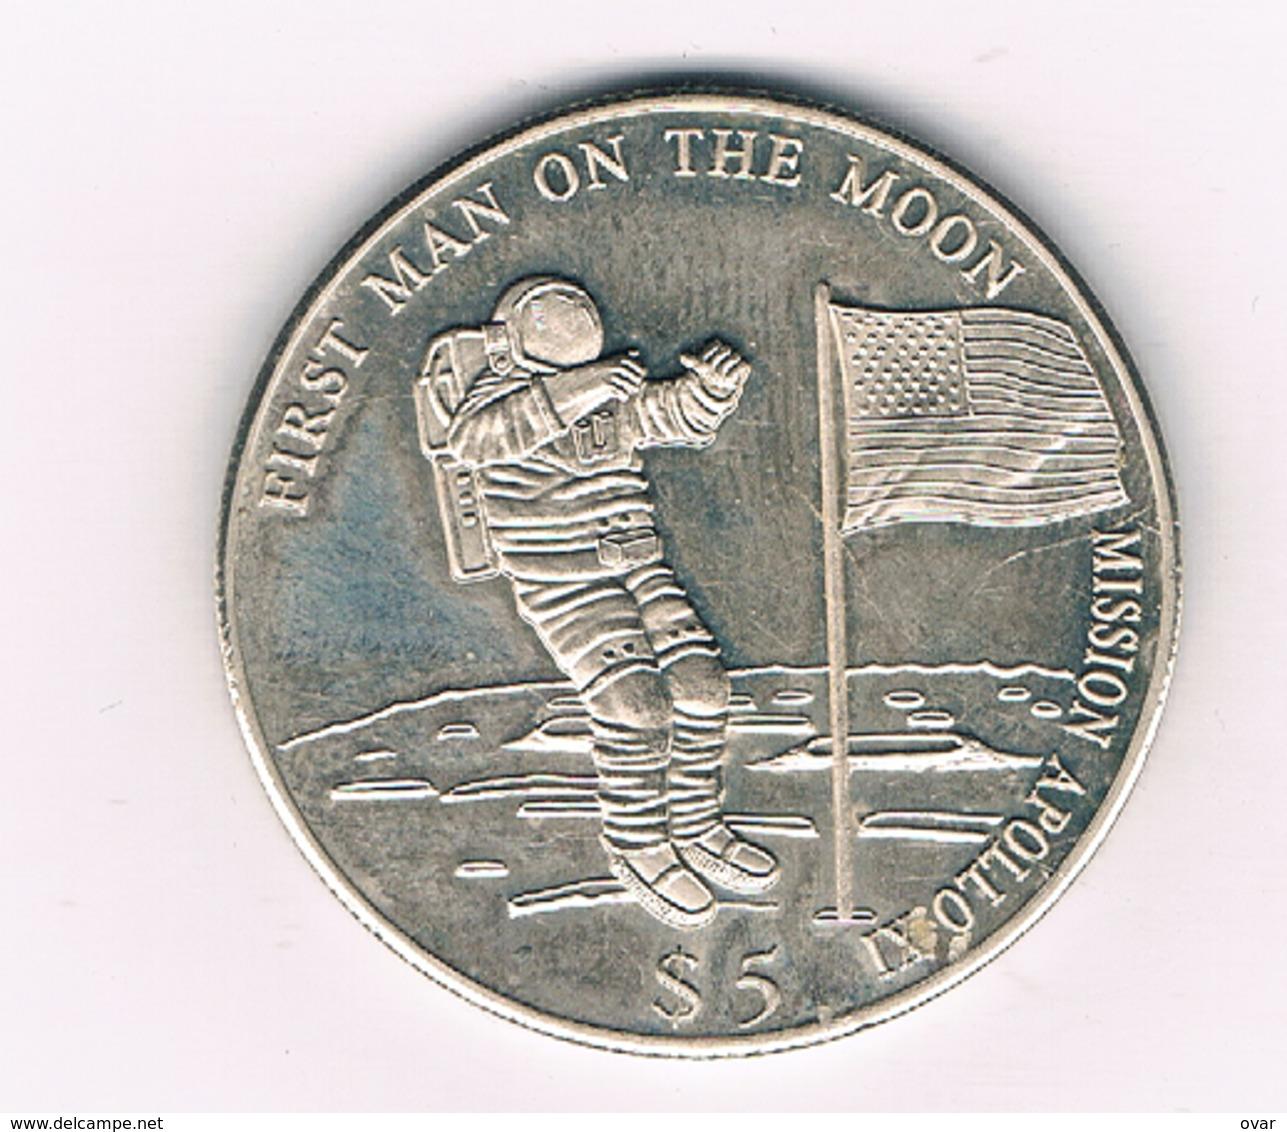 5 DOLLAR 2000 LIBERIA /4240/ - Liberia